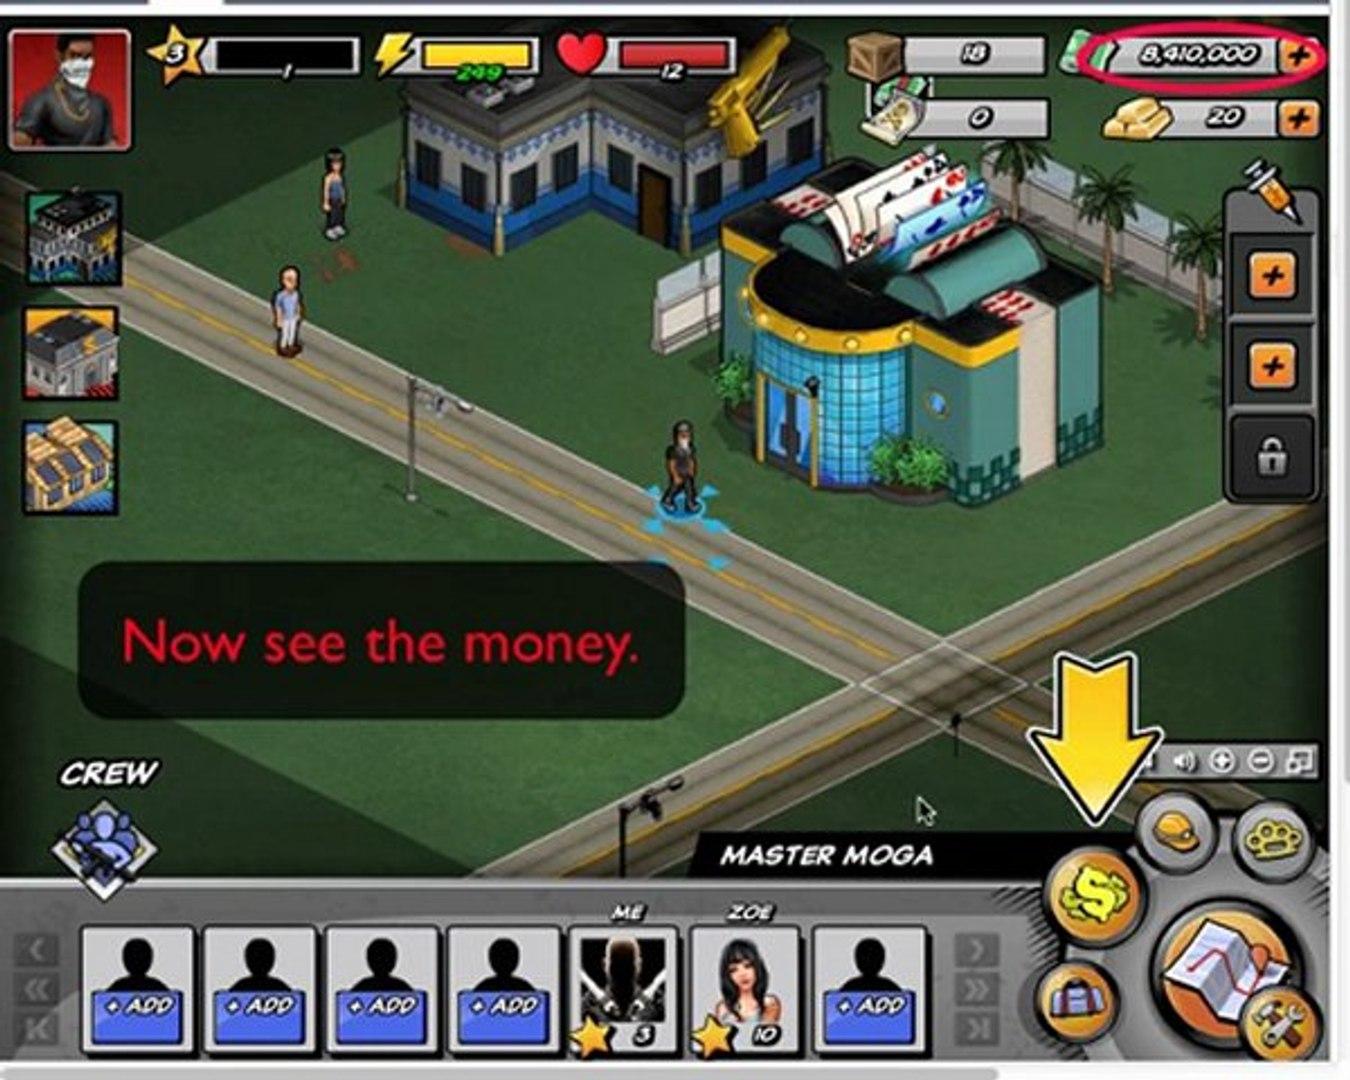 Mafia Wars 2 Cheat - Mafia Wars 2 Unlimited Money Cheats